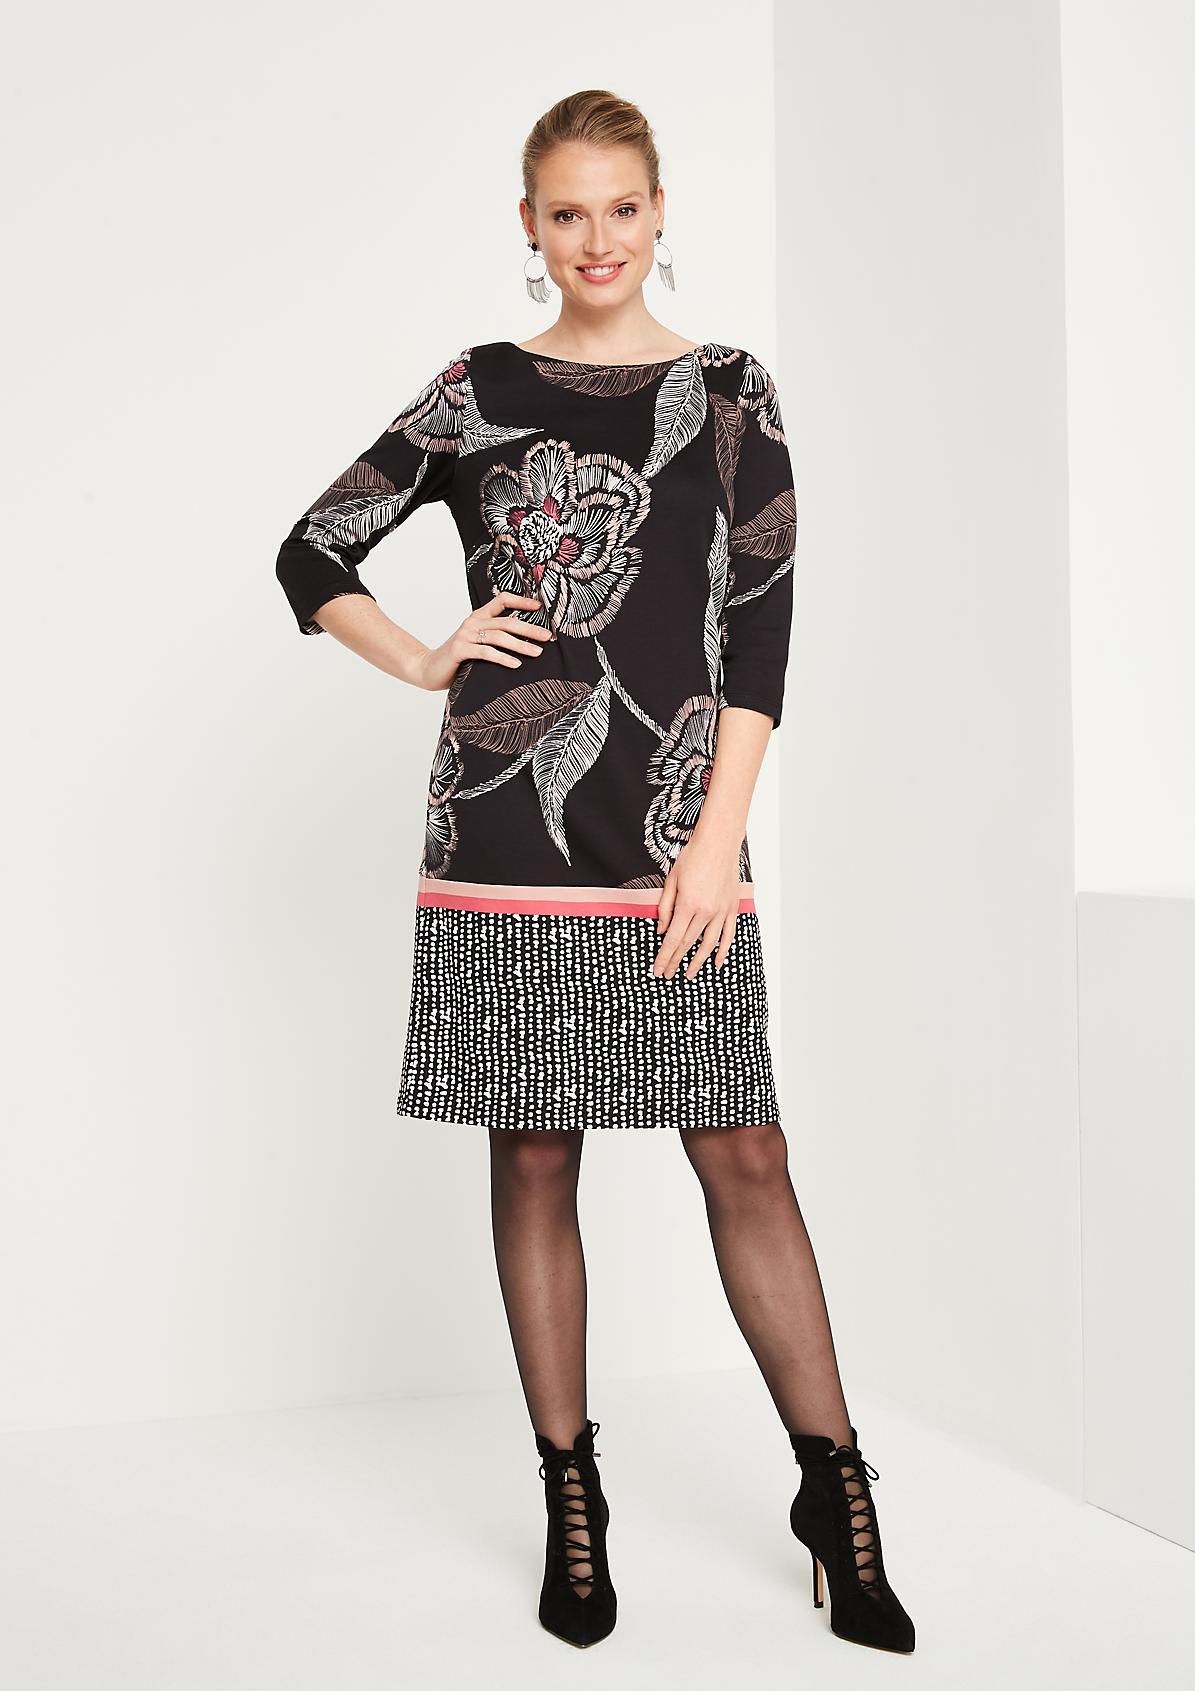 Jerseykleid mit farbenprächtigem Floral-Alloverprint